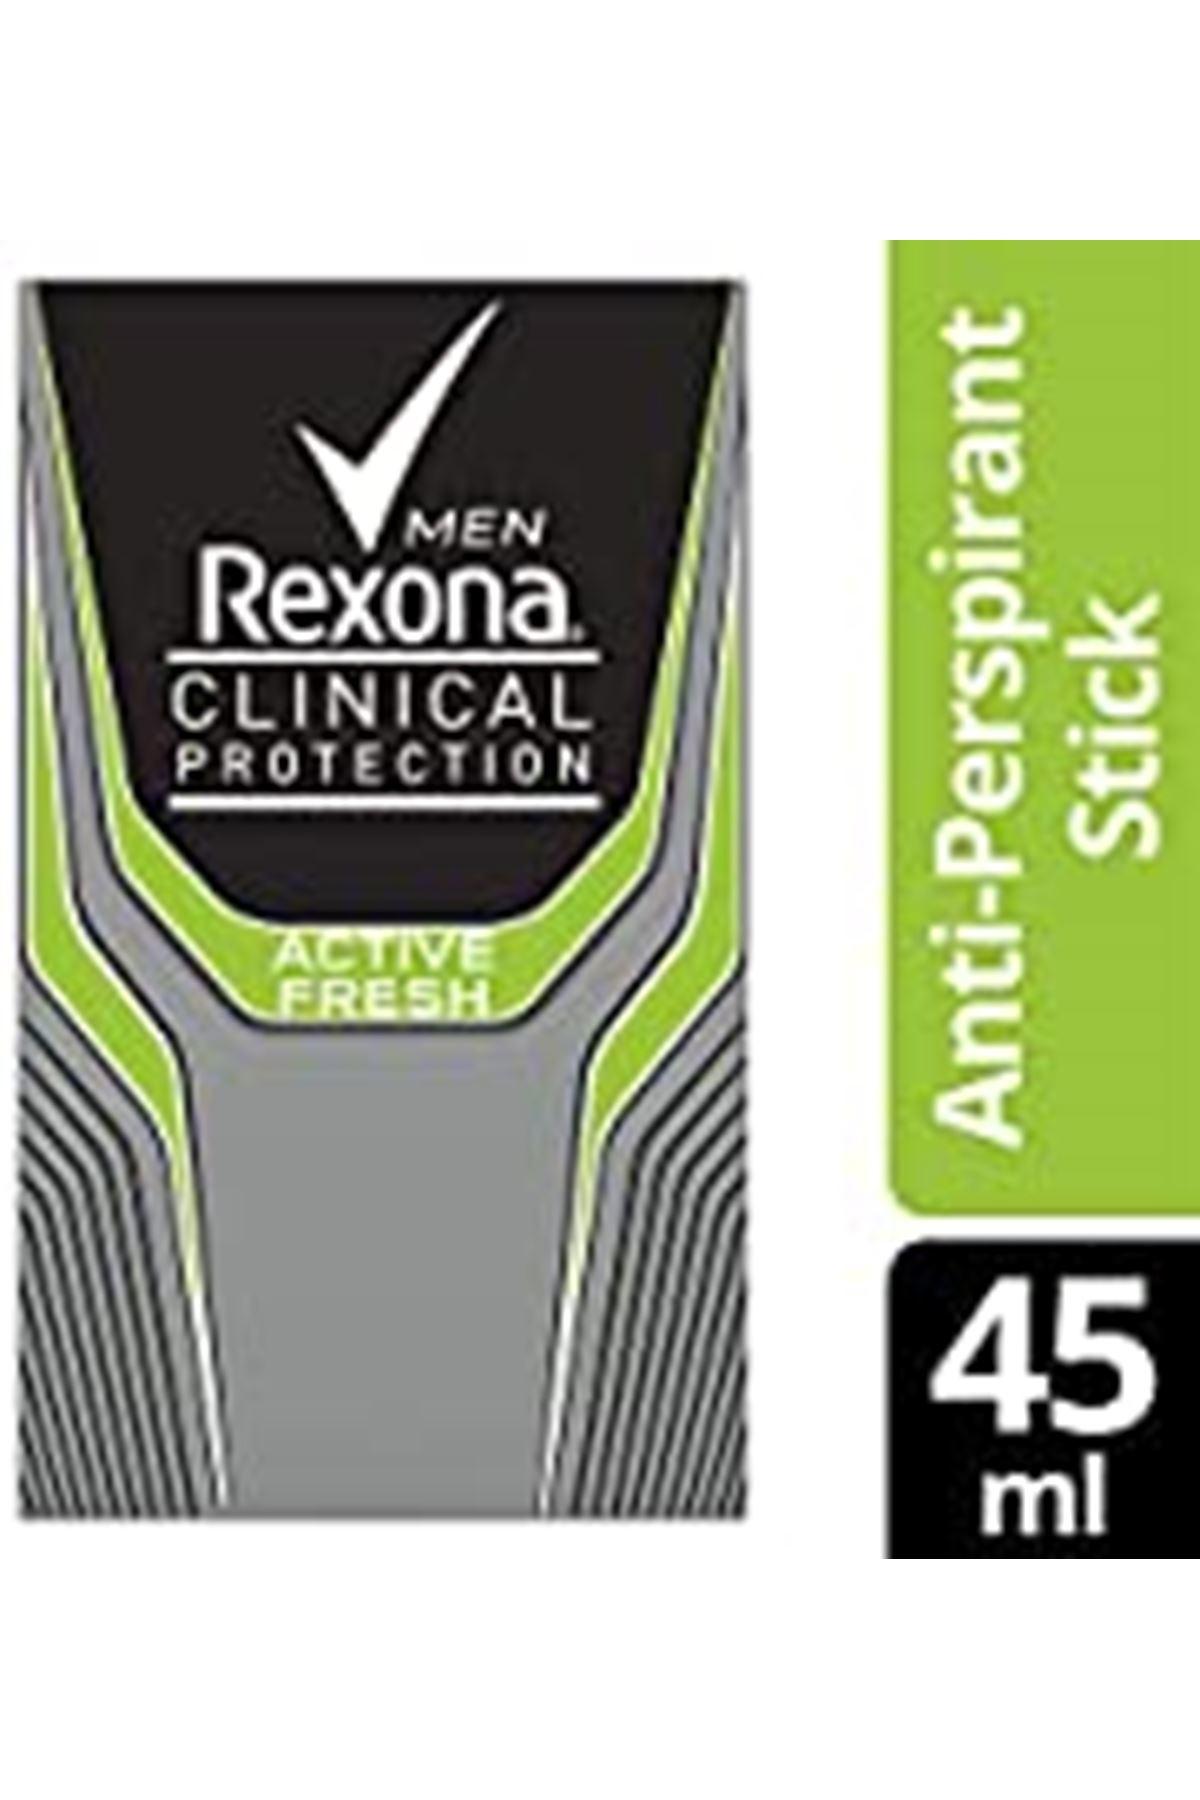 Rexona Erkek Clinical Protection Deodorant Stick Active Fresh 45 ml